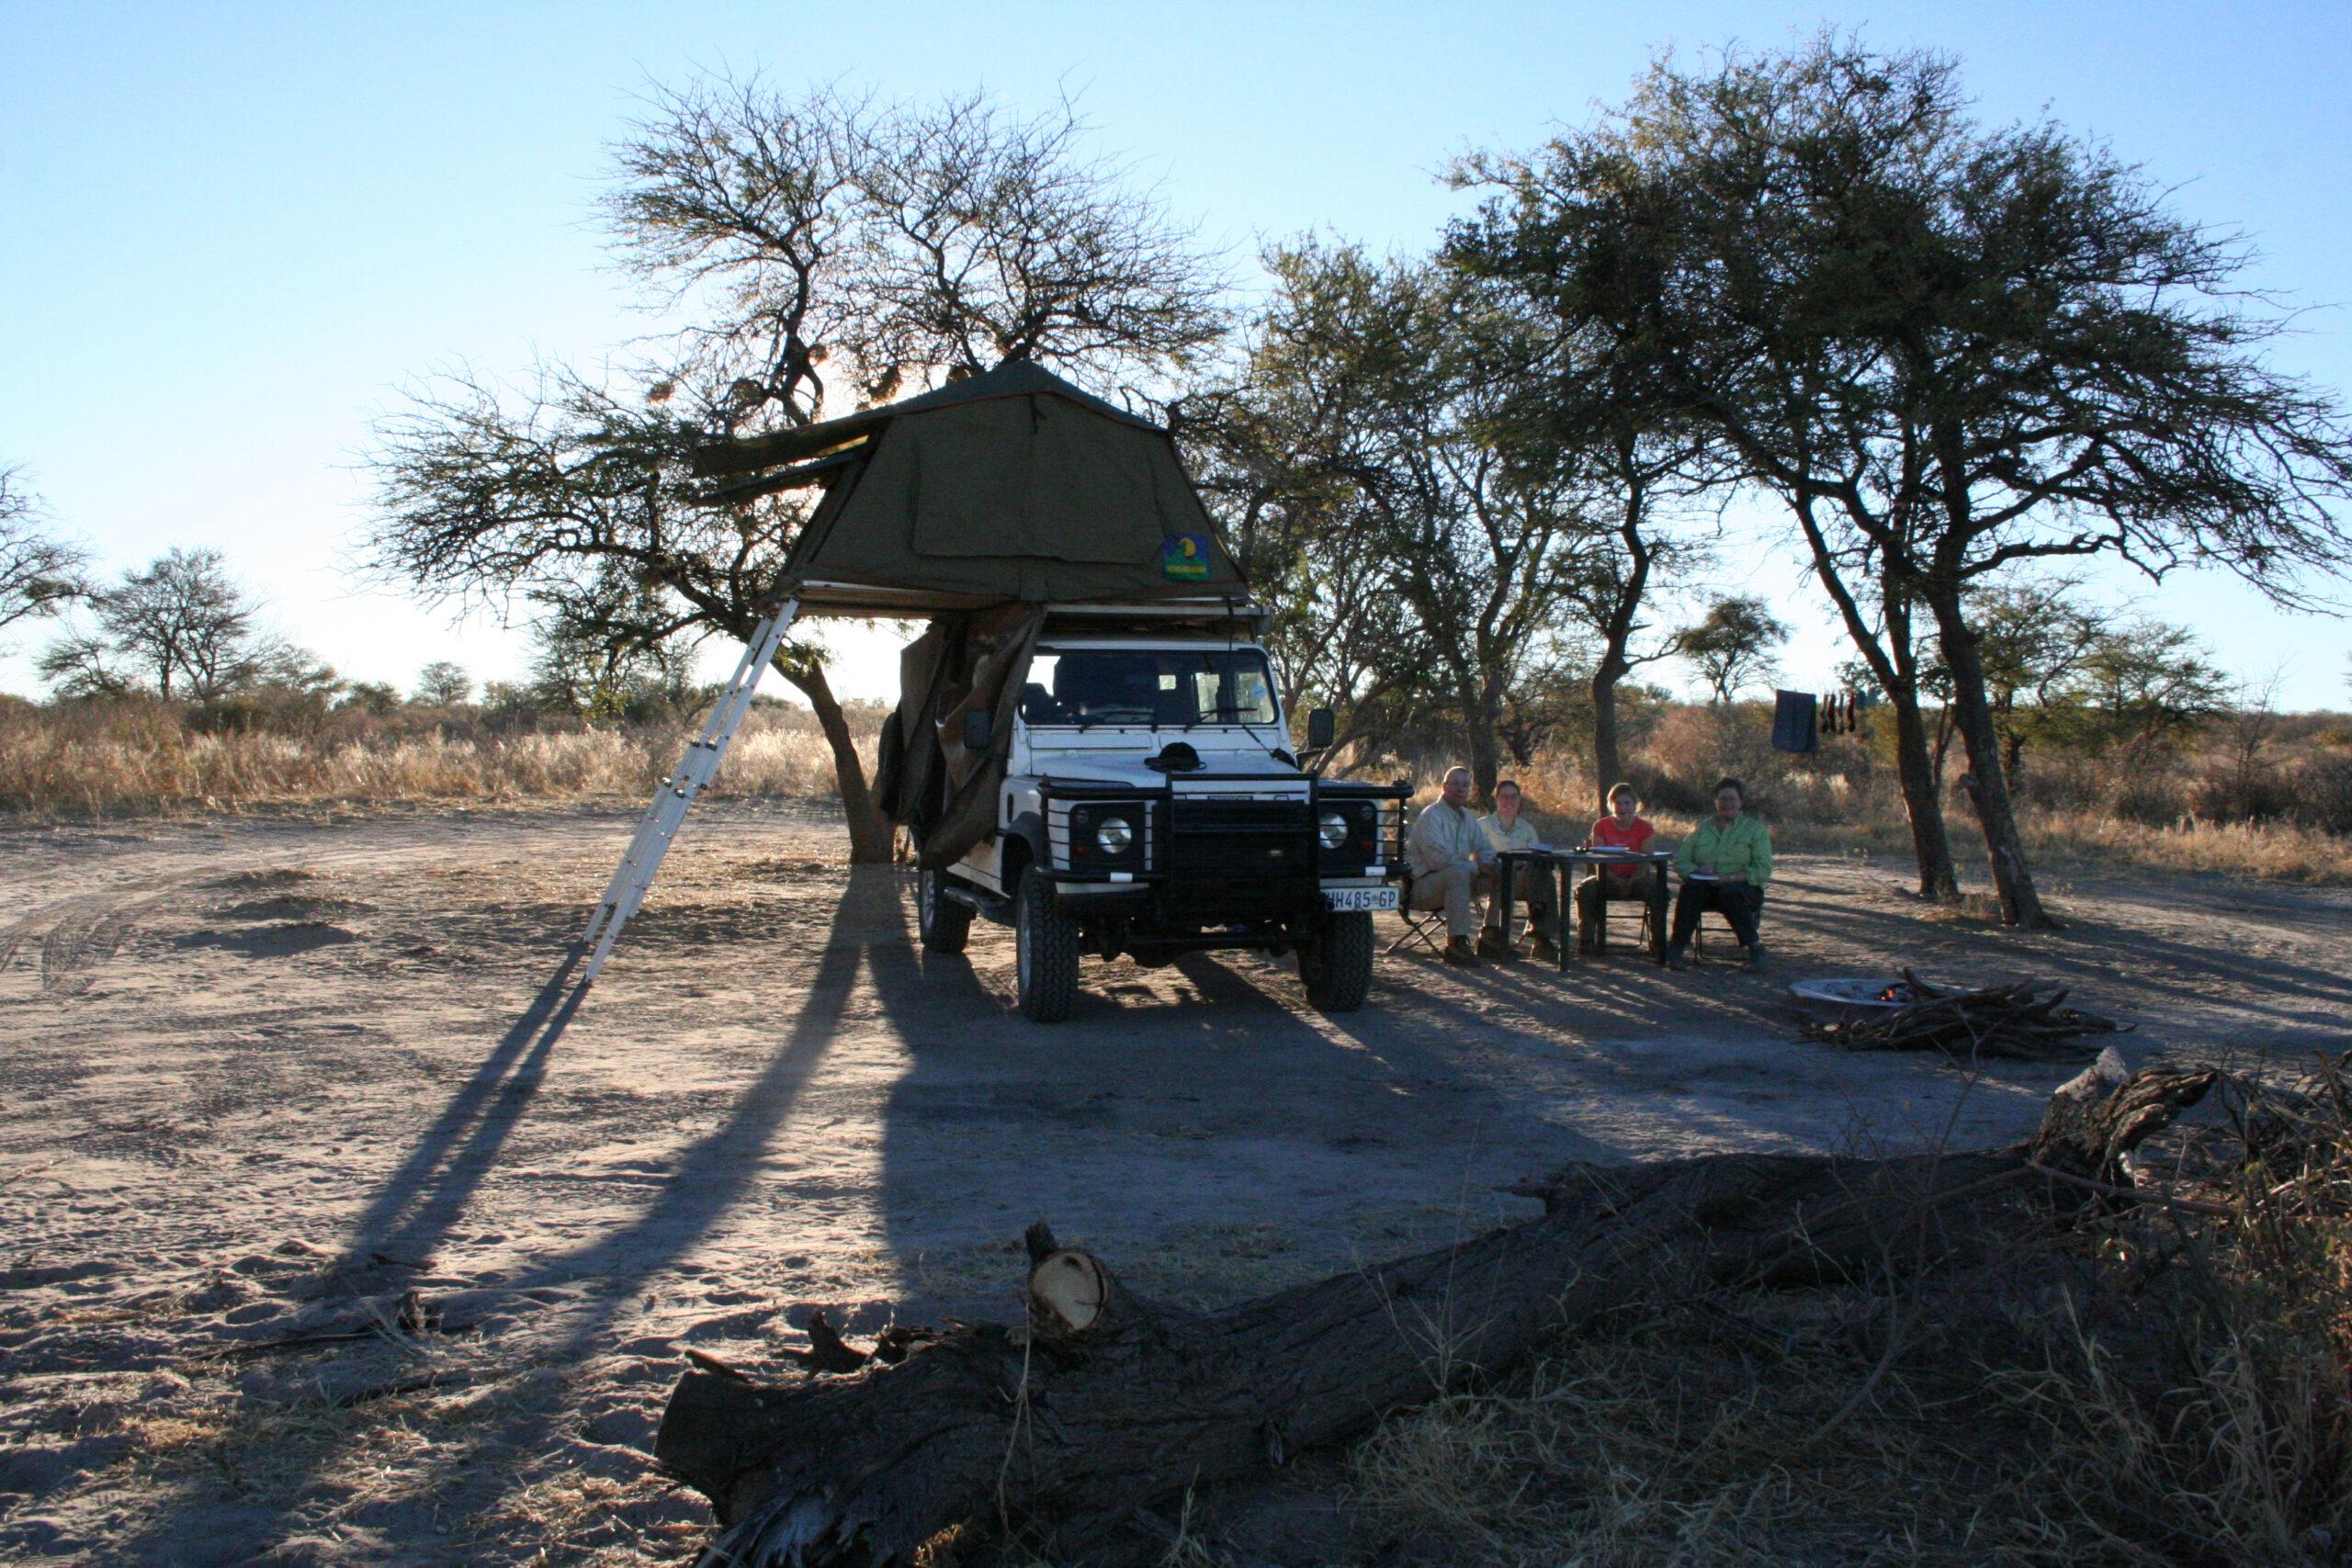 Passarge Valley in Central Kalahari Game Reserve Botswana